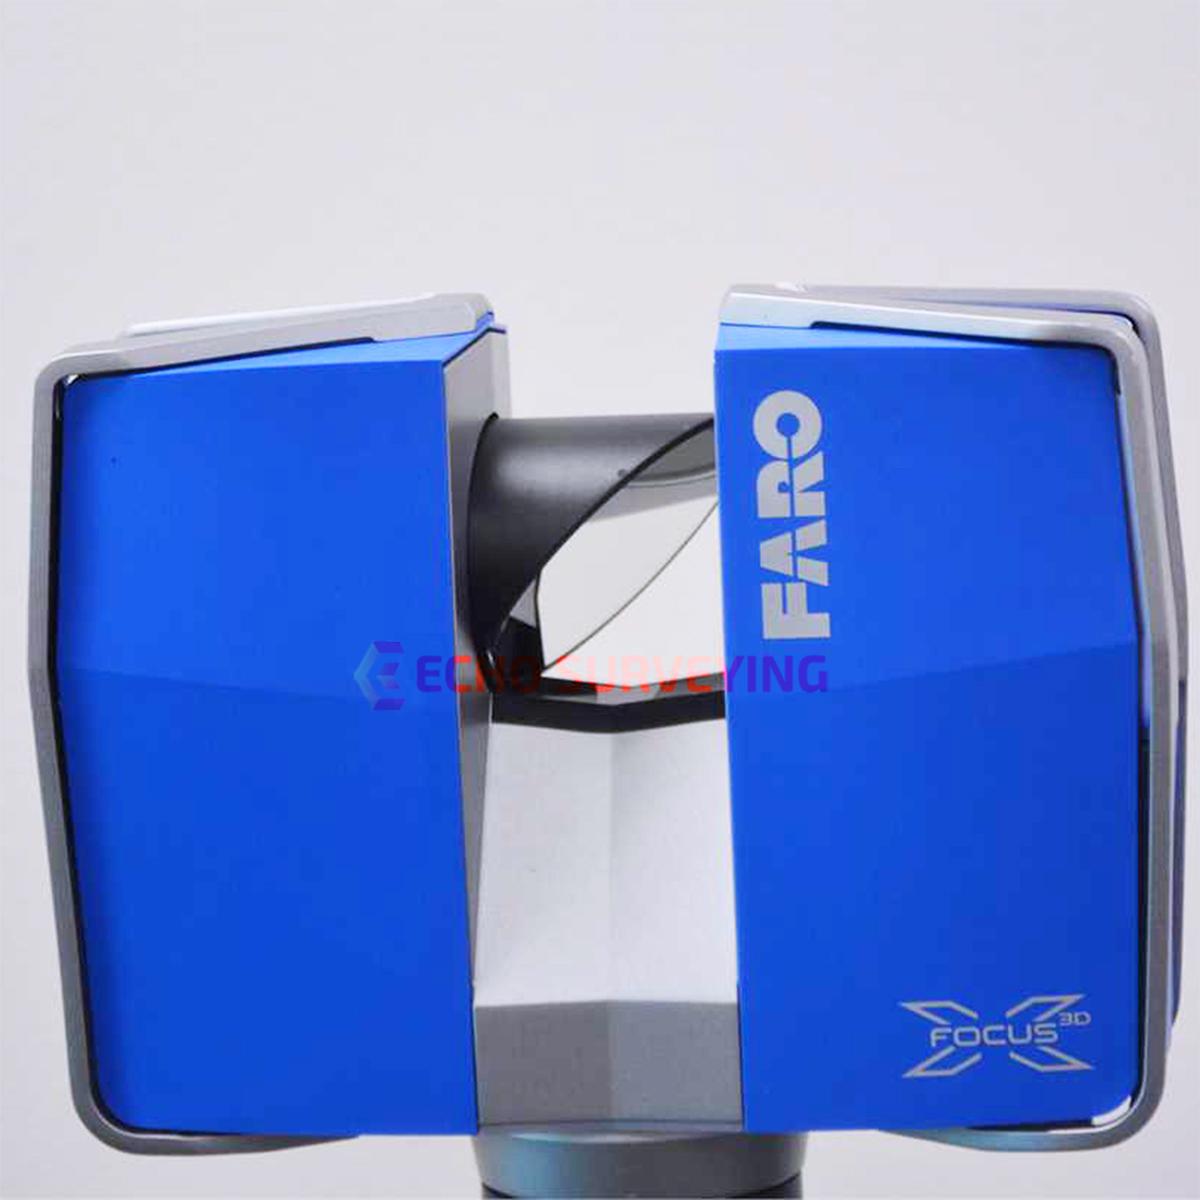 Used-Faro-Focus-3D-X-330-HDR.jpg